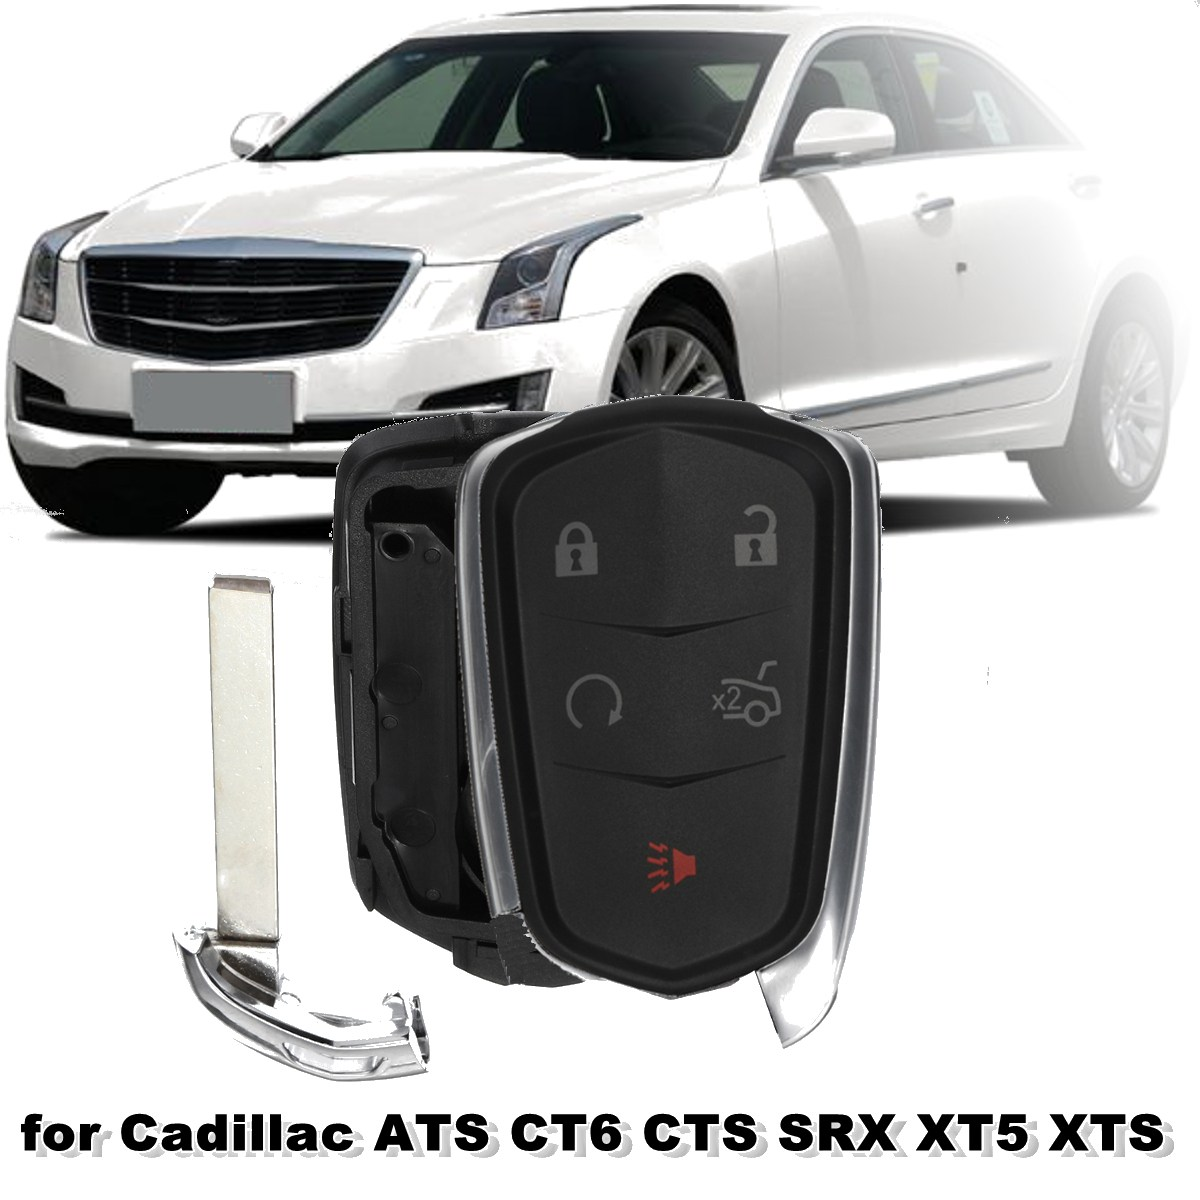 #HYQ2AB #HYQ2EB #1511A-2B #1511A-2EB 5 Buttons Remote Key Case Fob Shell For Cadillac ATS CT6 CTS SRX XT5 XTS 2014 2015 2016